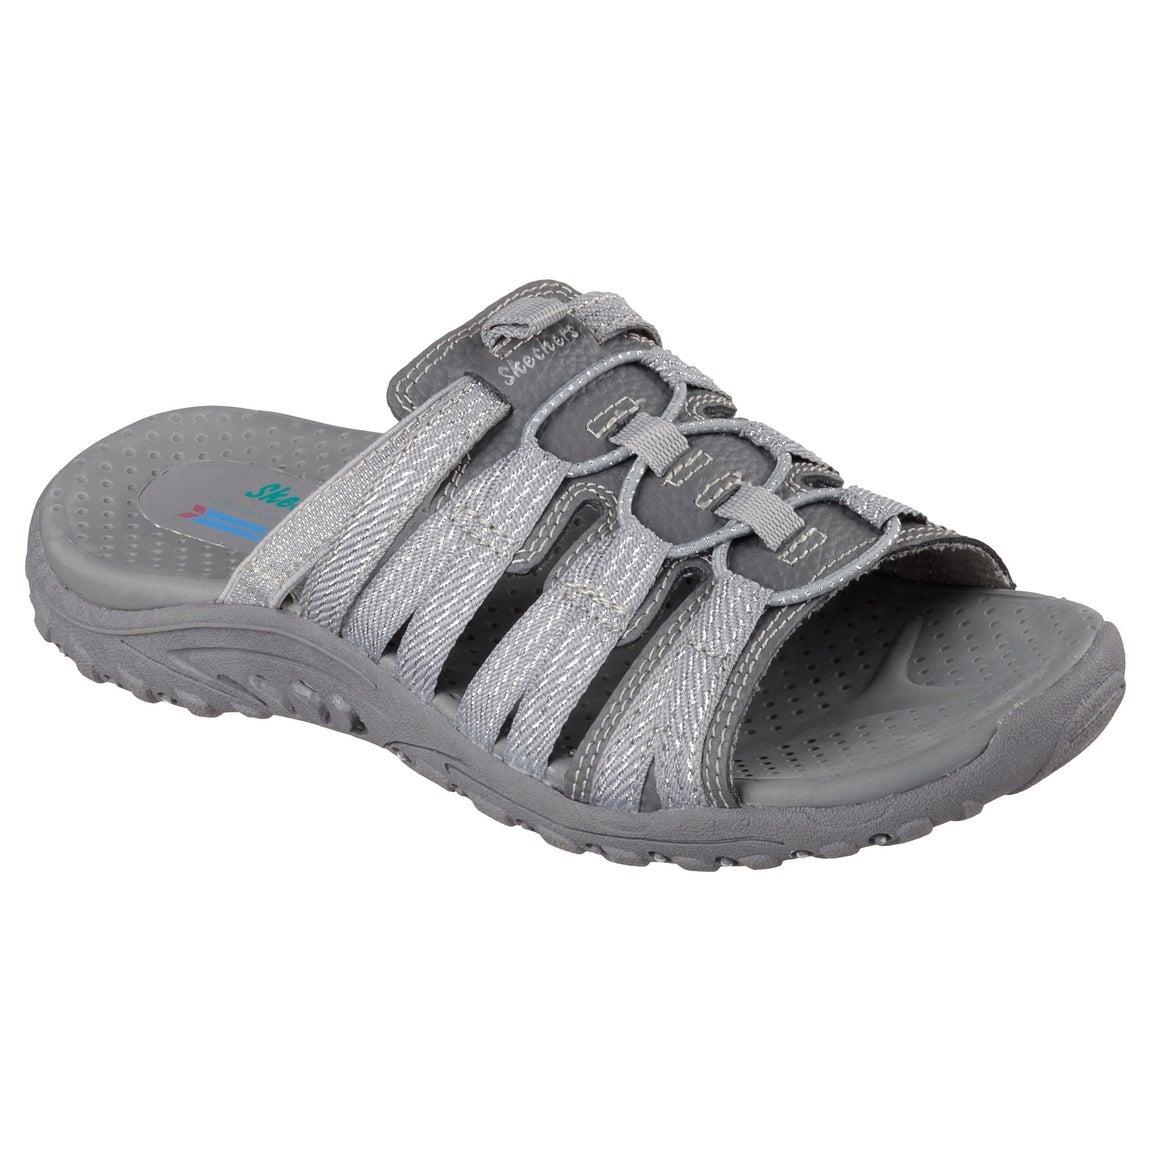 skechers reggae repetition sandals